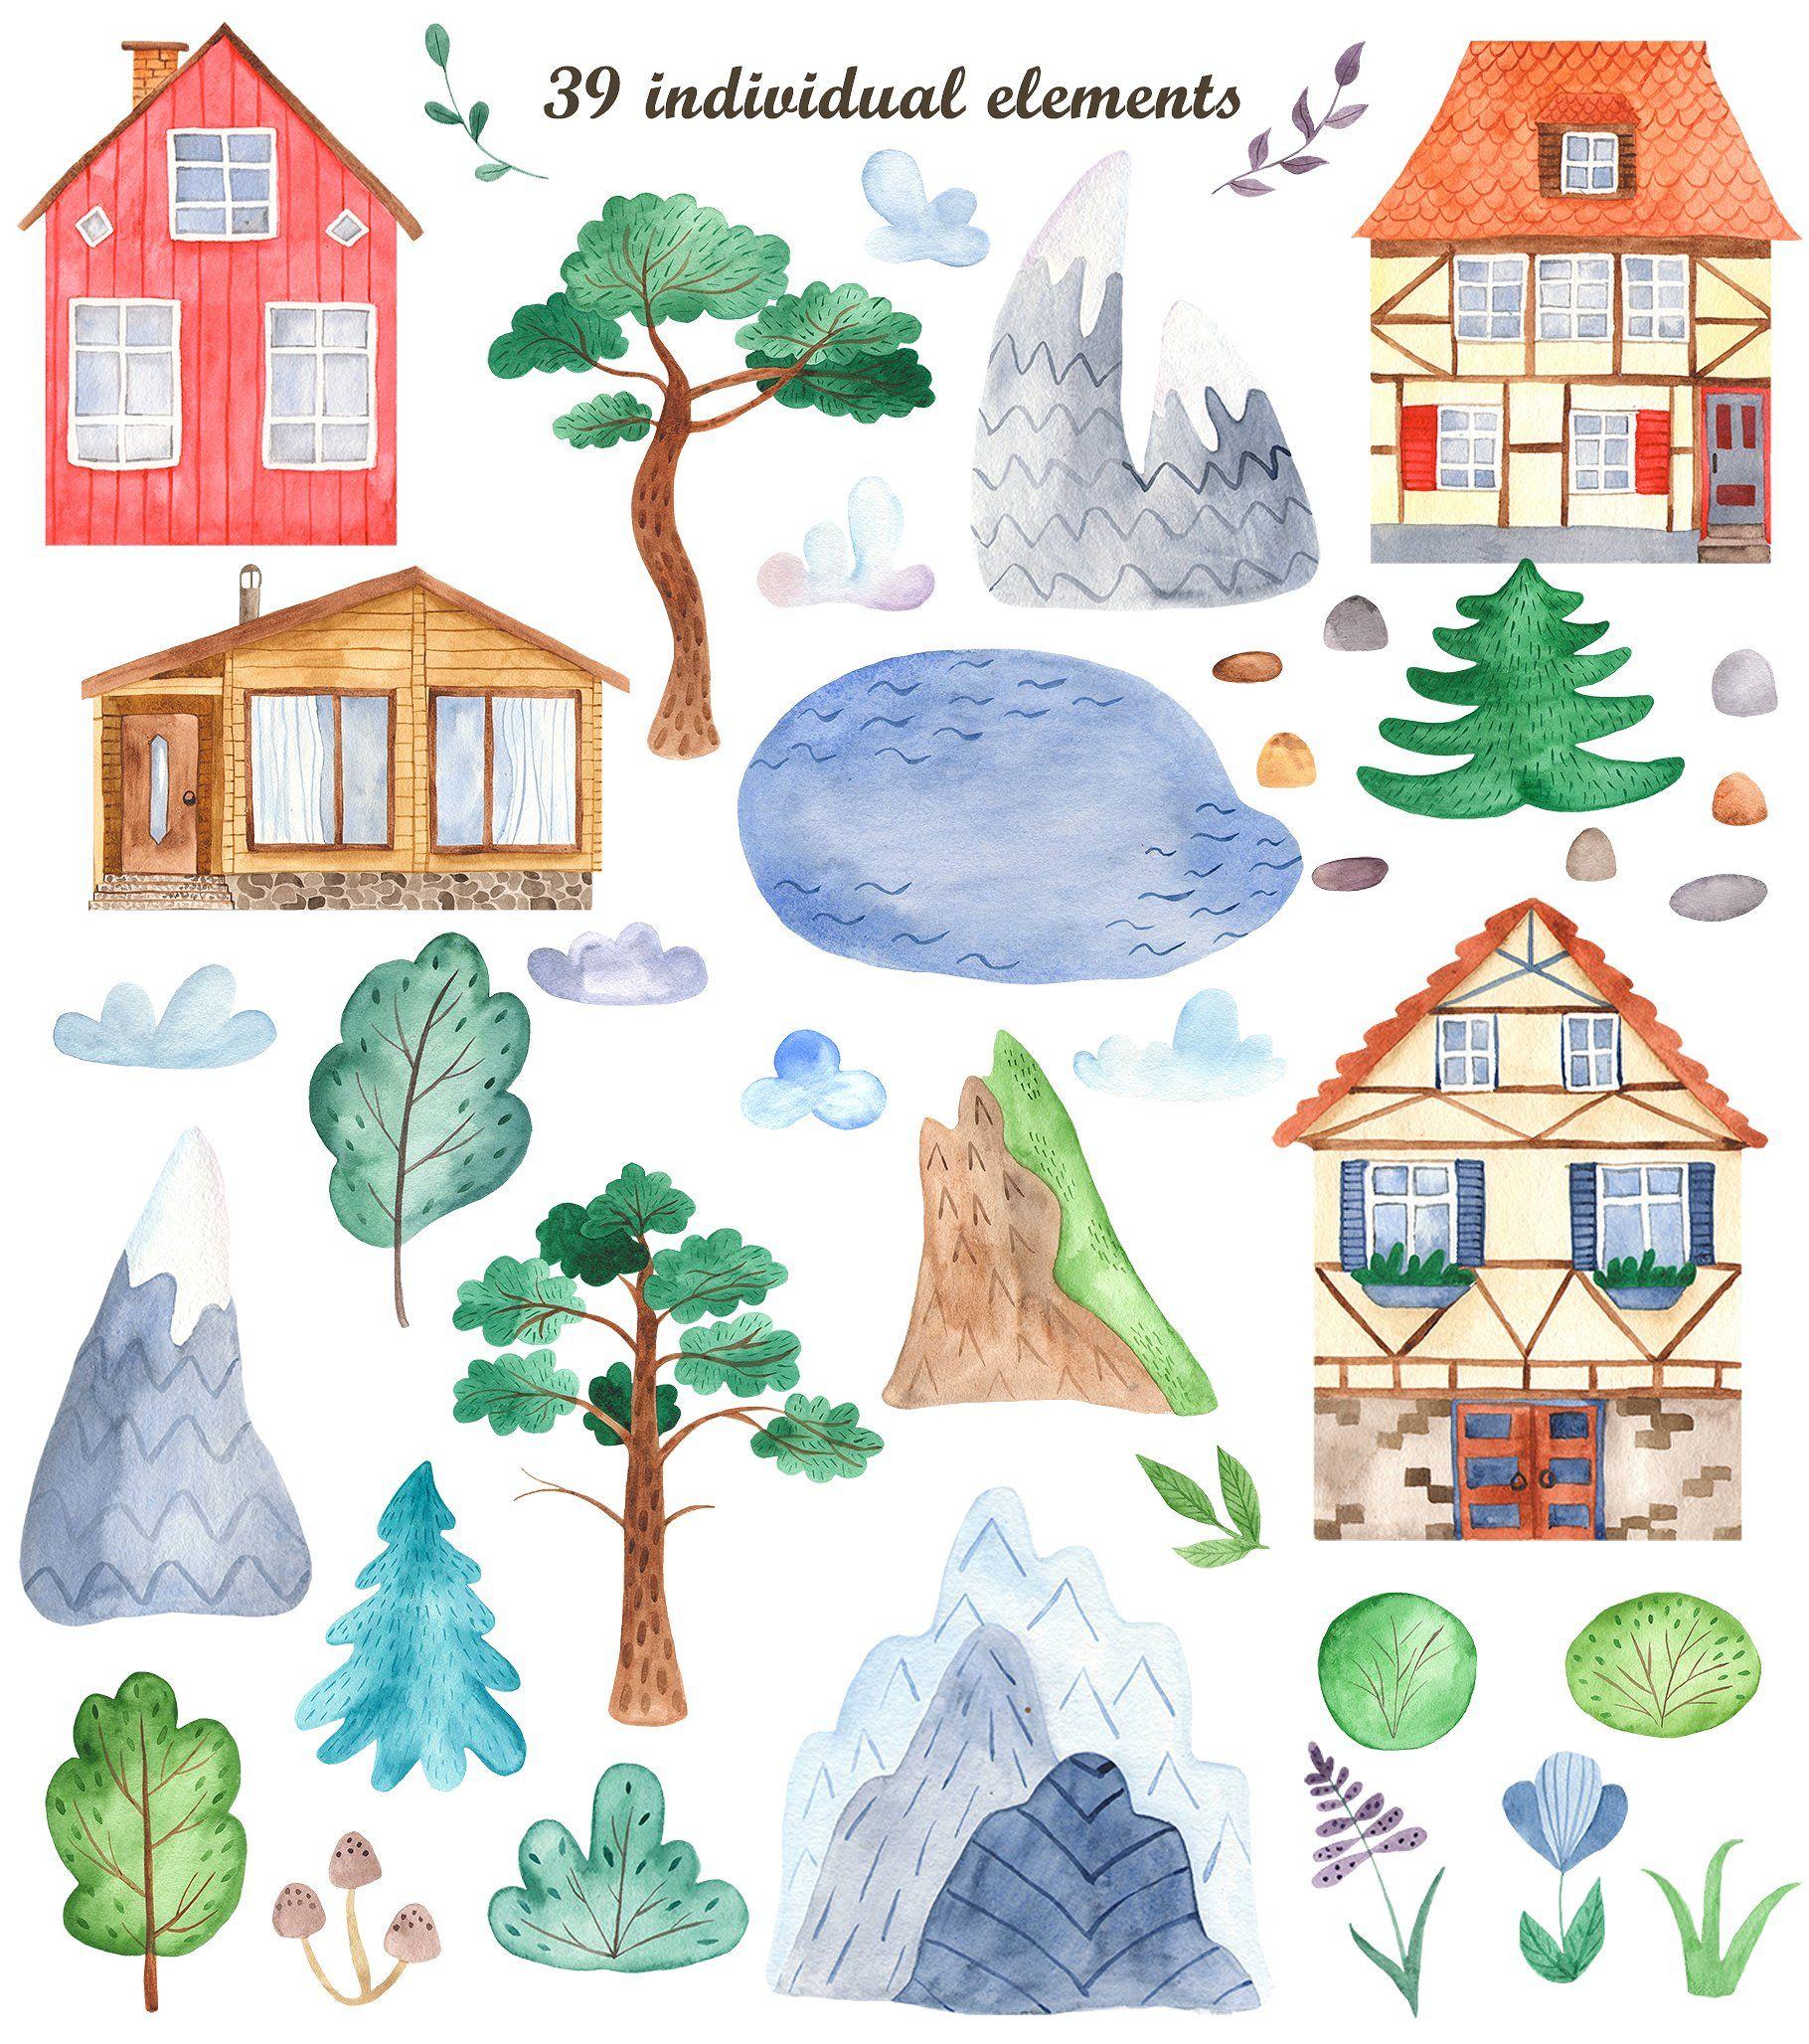 Home Logo clipart - House, Home, Text, transparent clip art